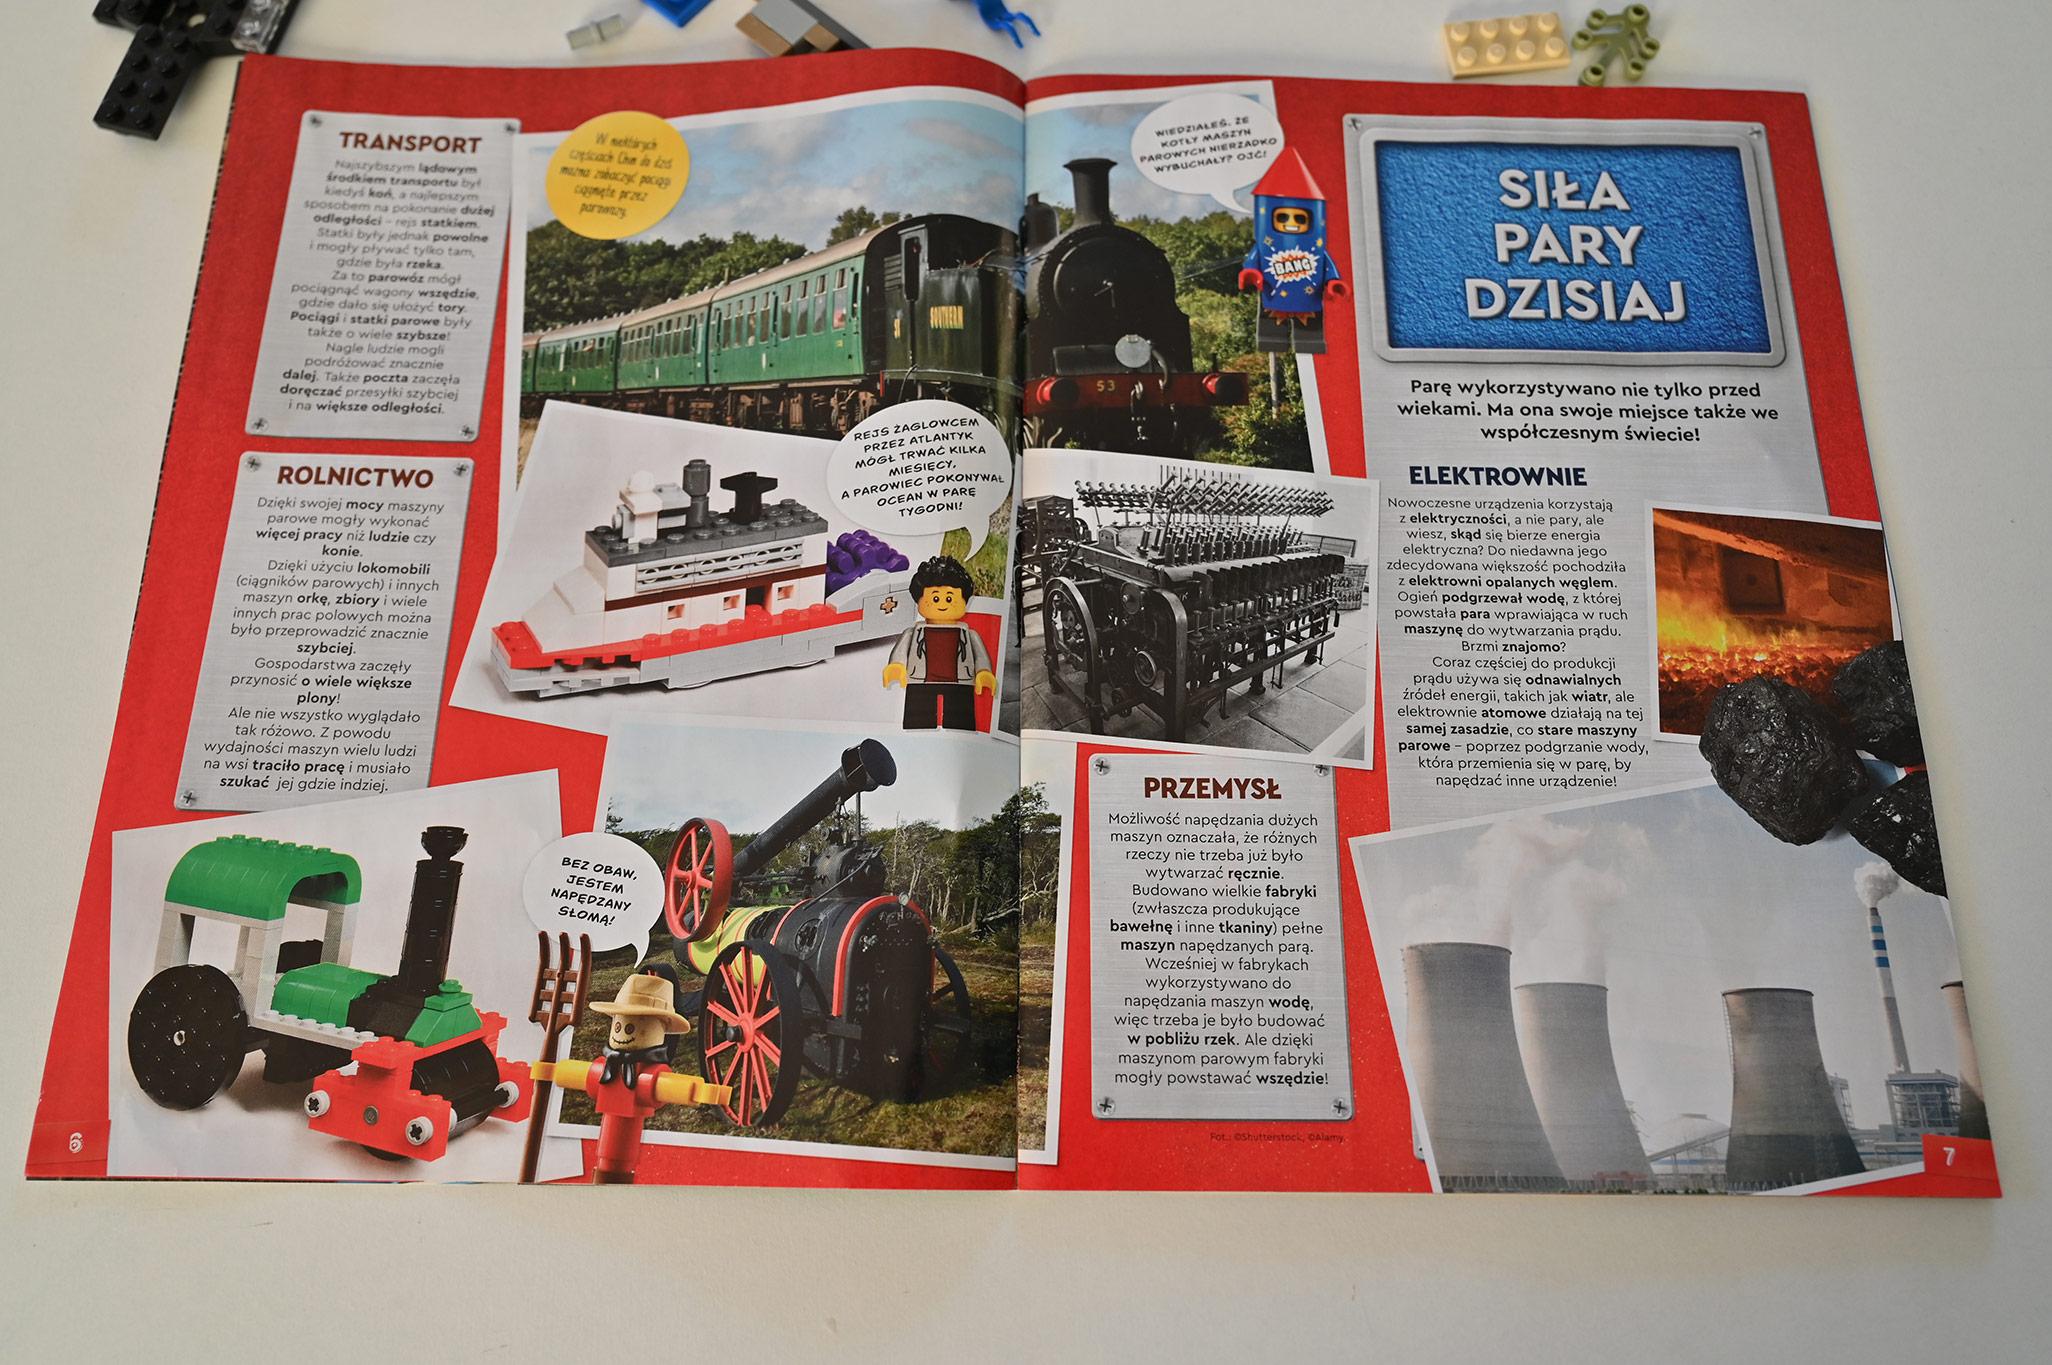 Pomysły na budowle z Lego, magazyn lego explorer